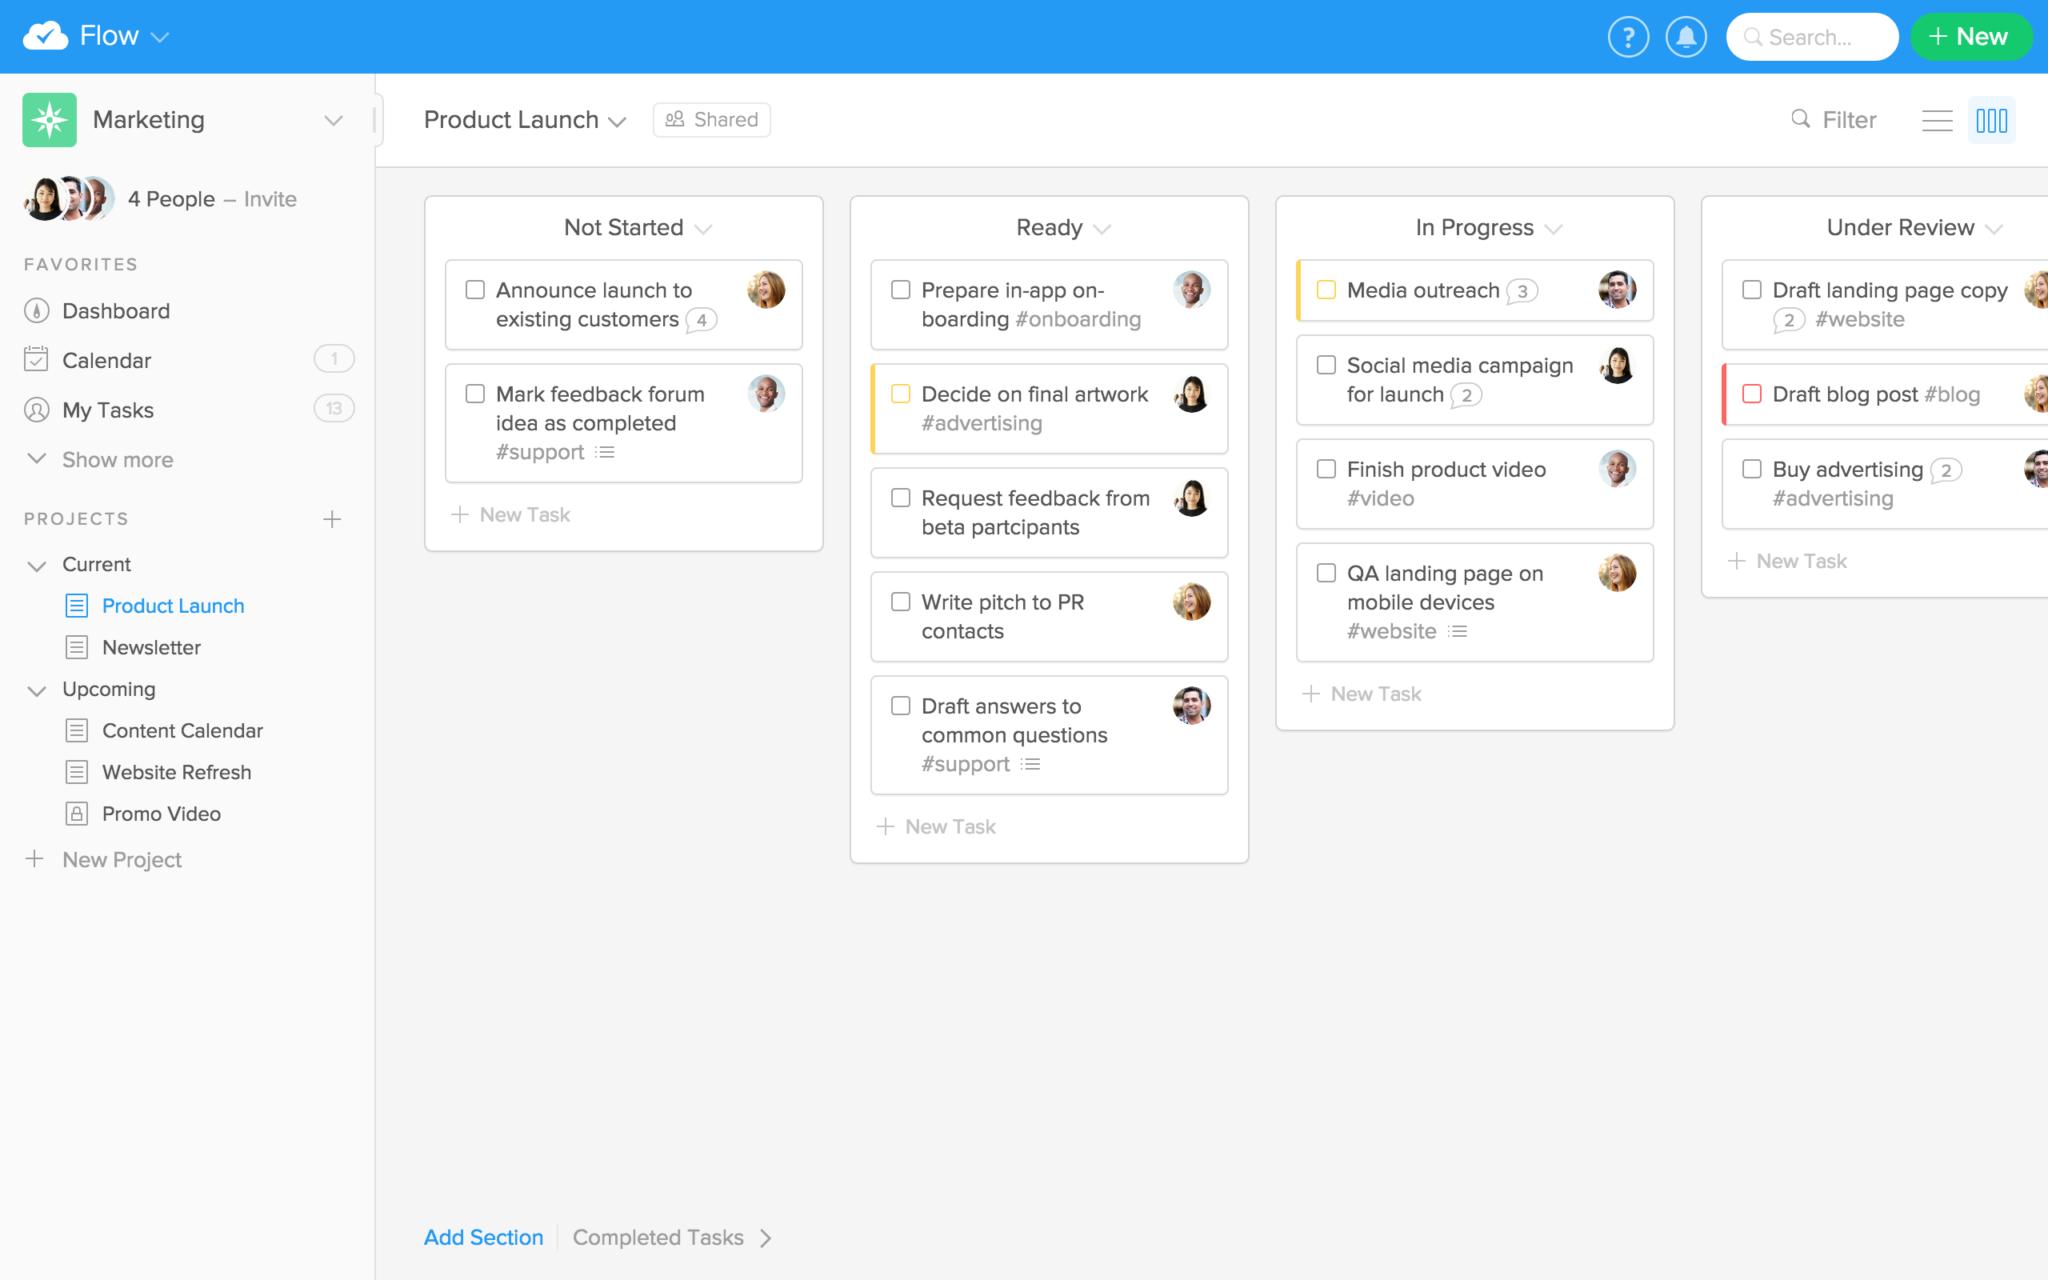 Flow Software - Kanban overview